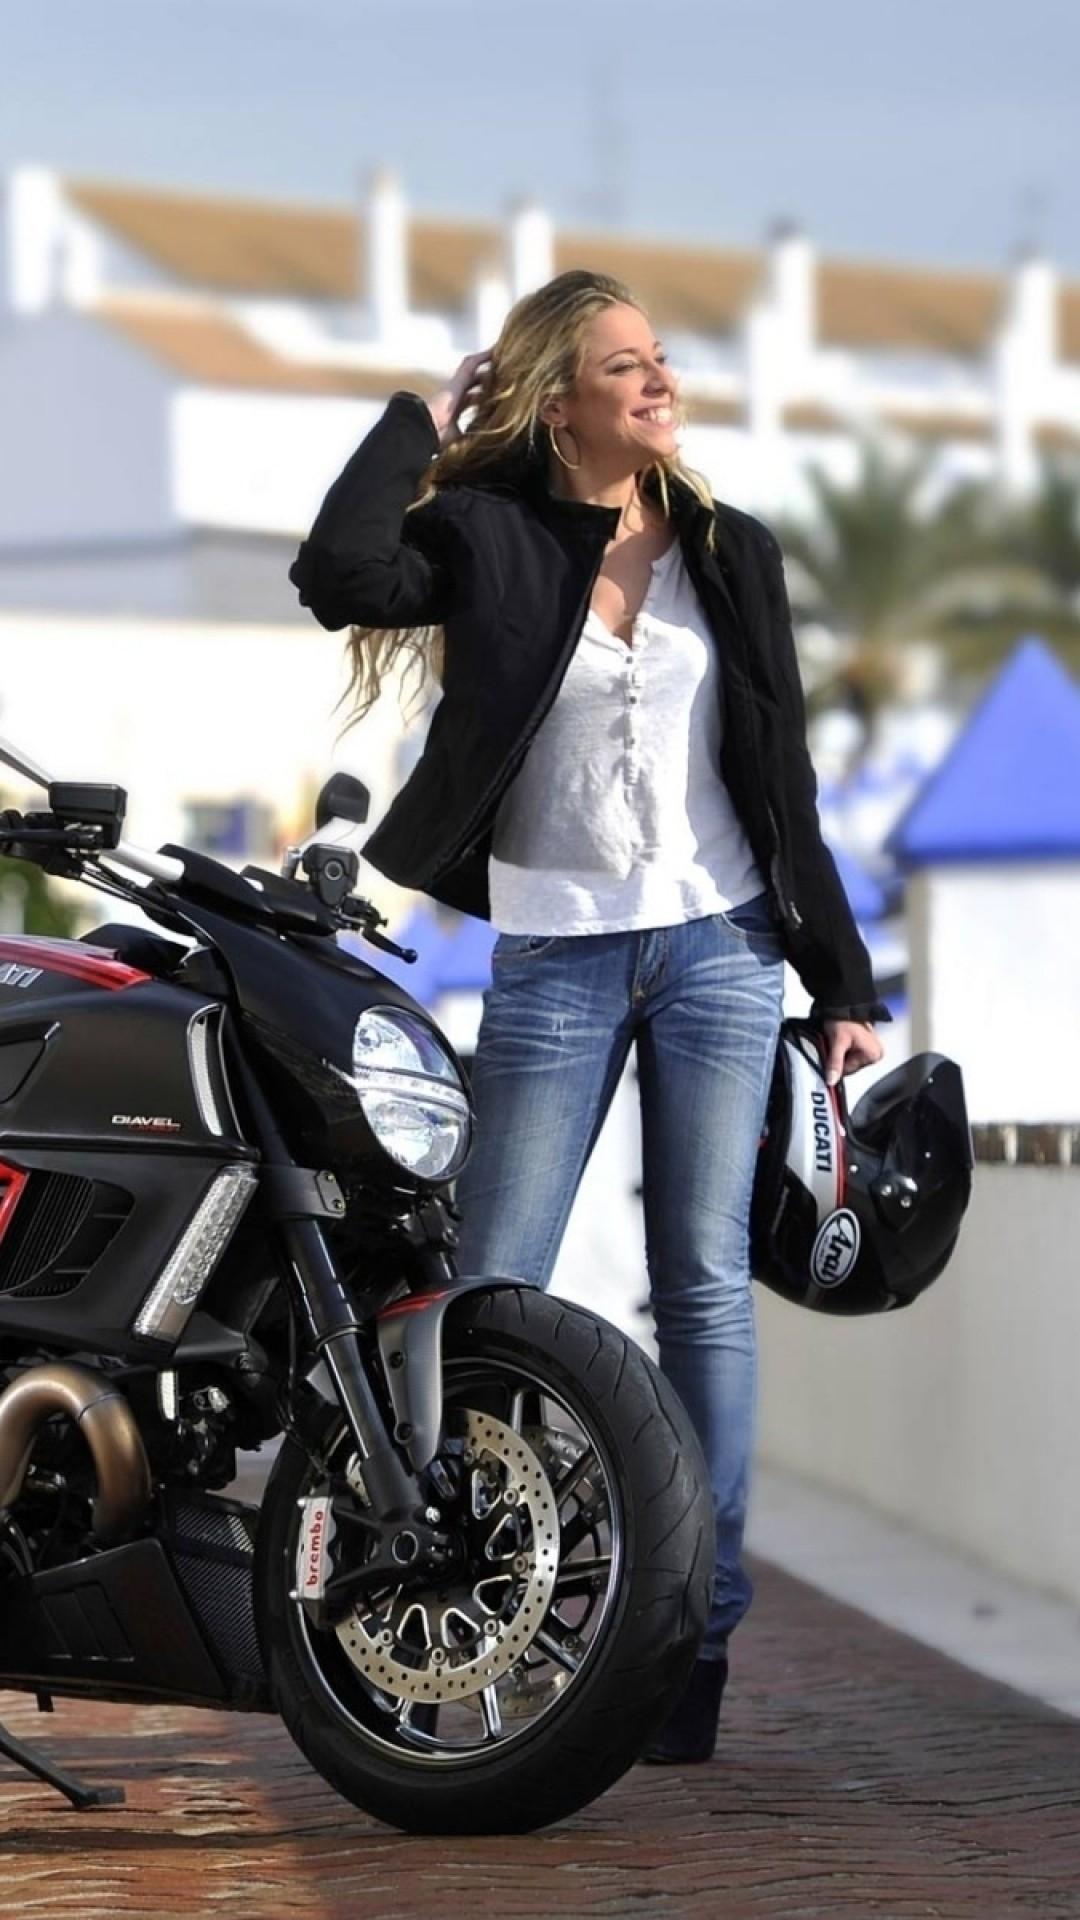 Wallpaper motorcycle, diavel, ducati, girl